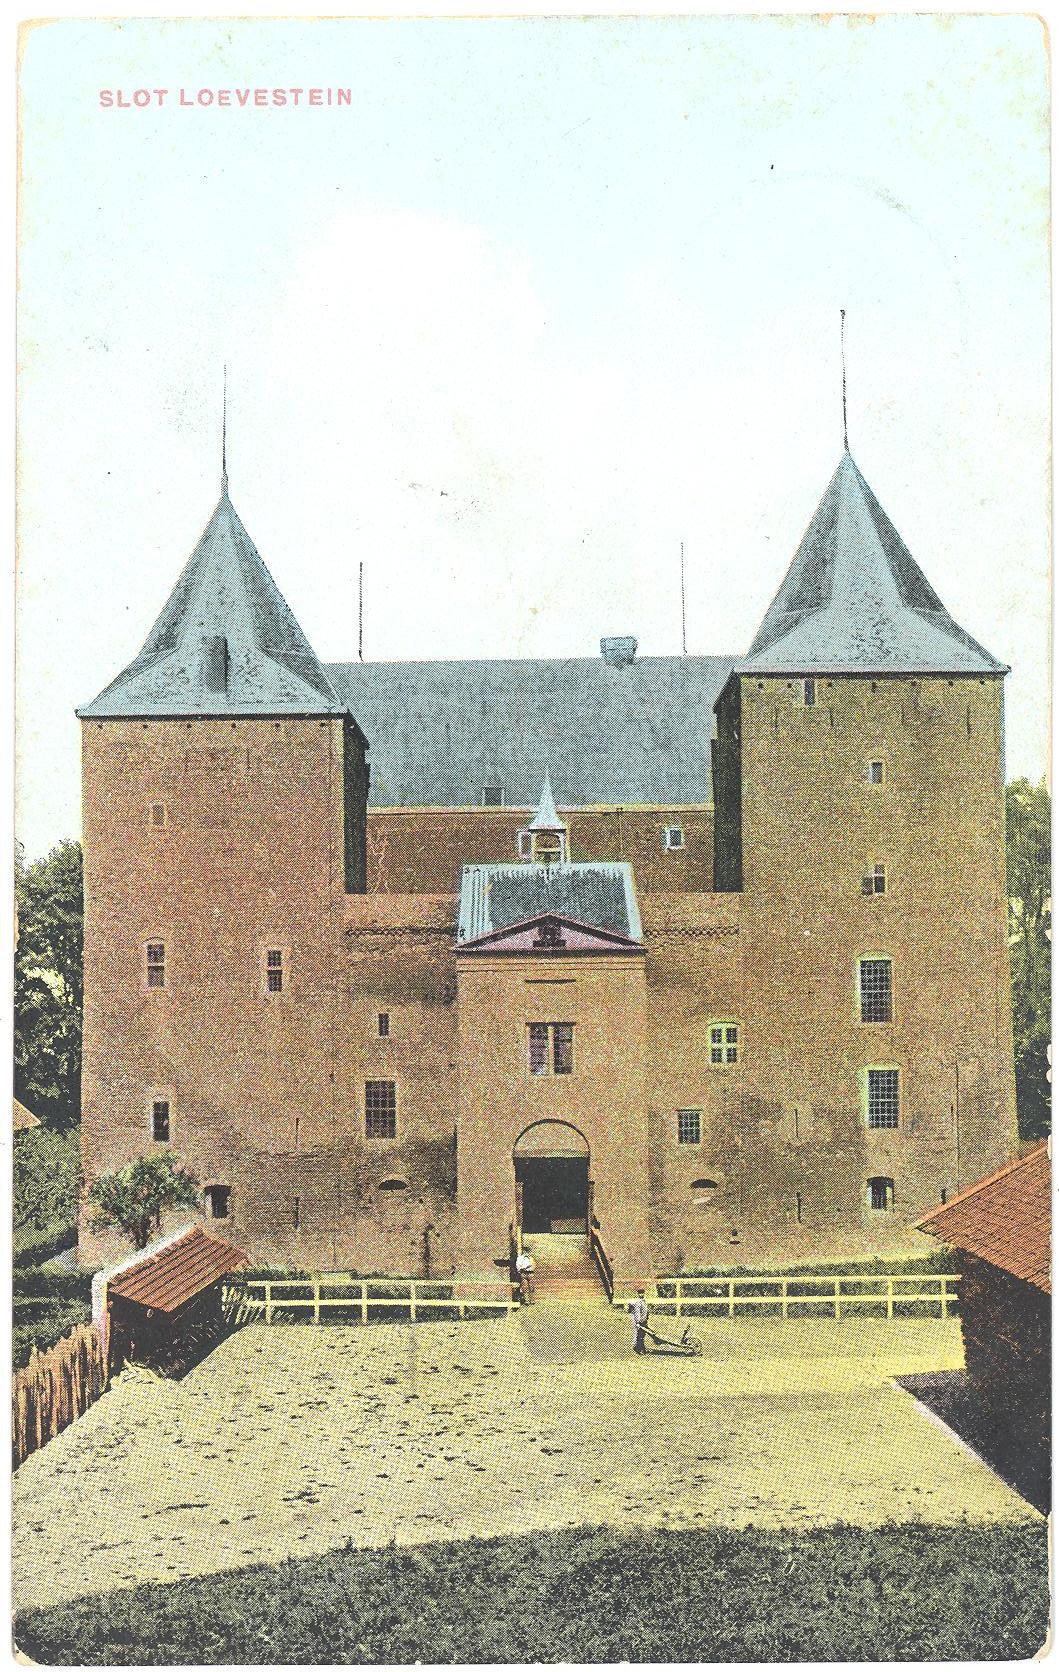 Slot-Loevestein-A13